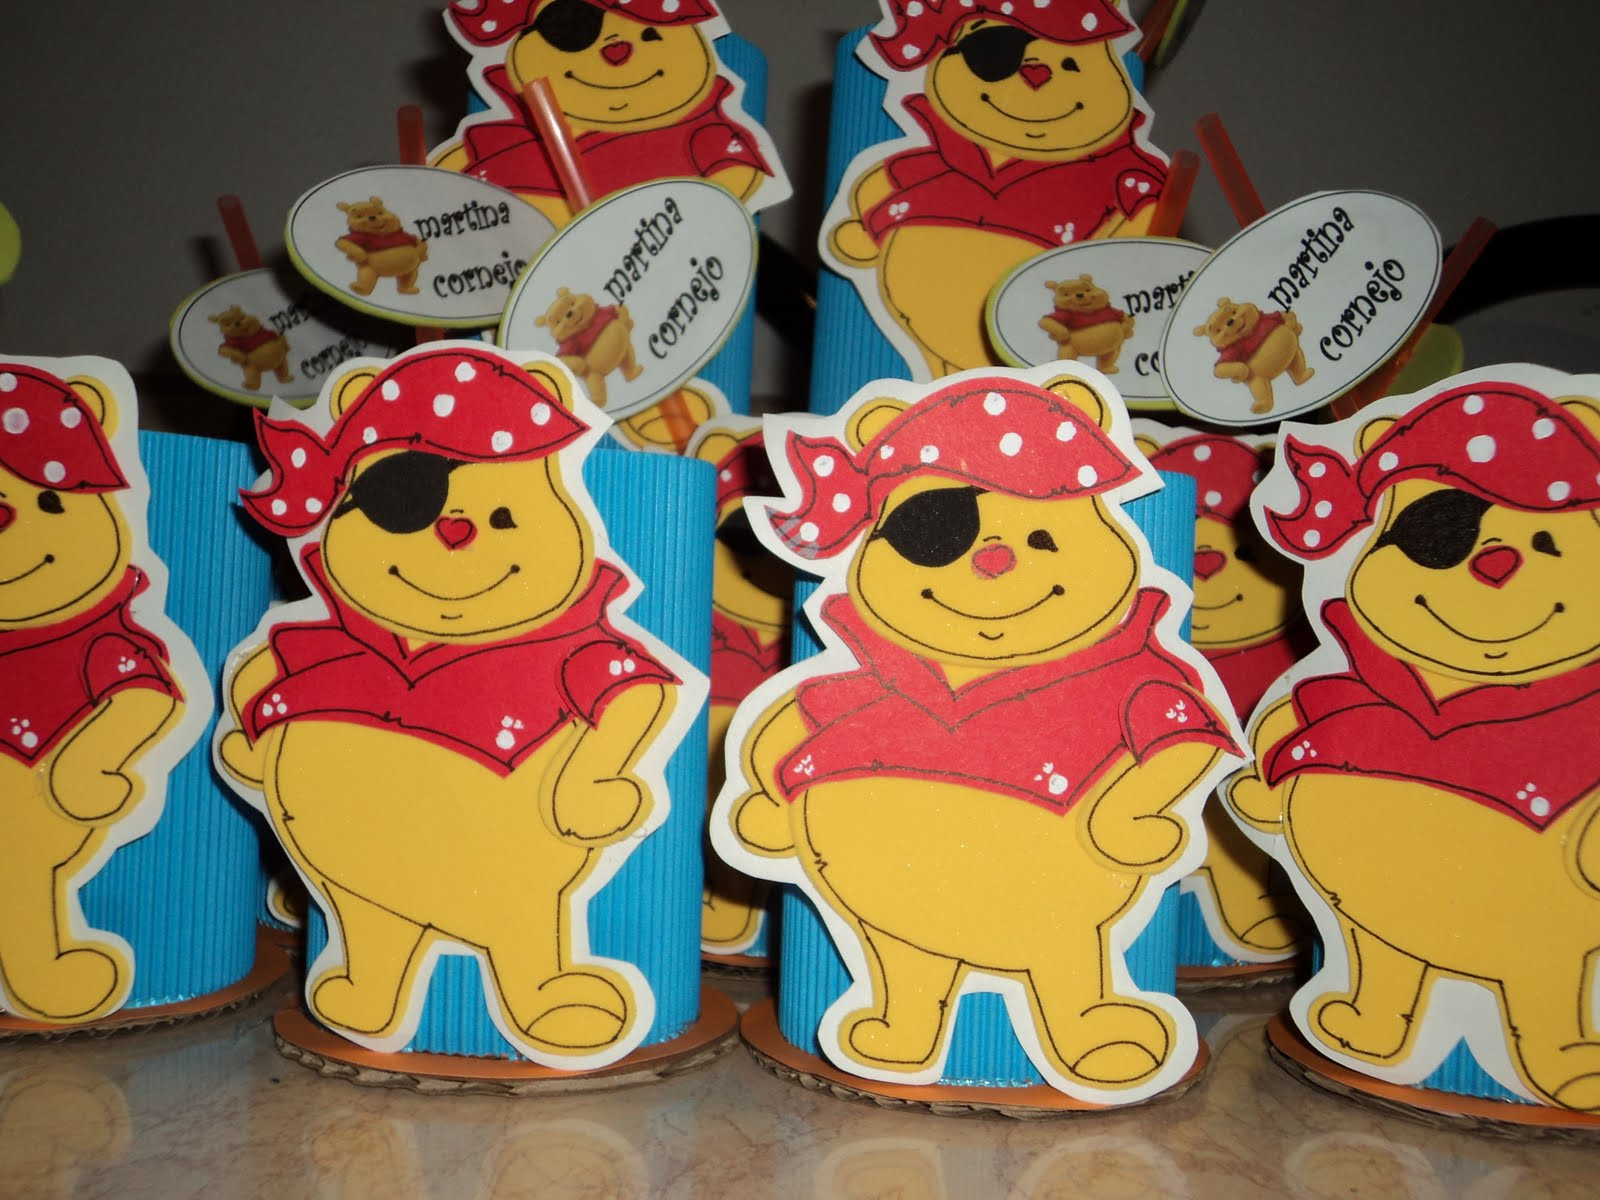 fiestas infantiles cajita sorpresera foamy moldes piglet